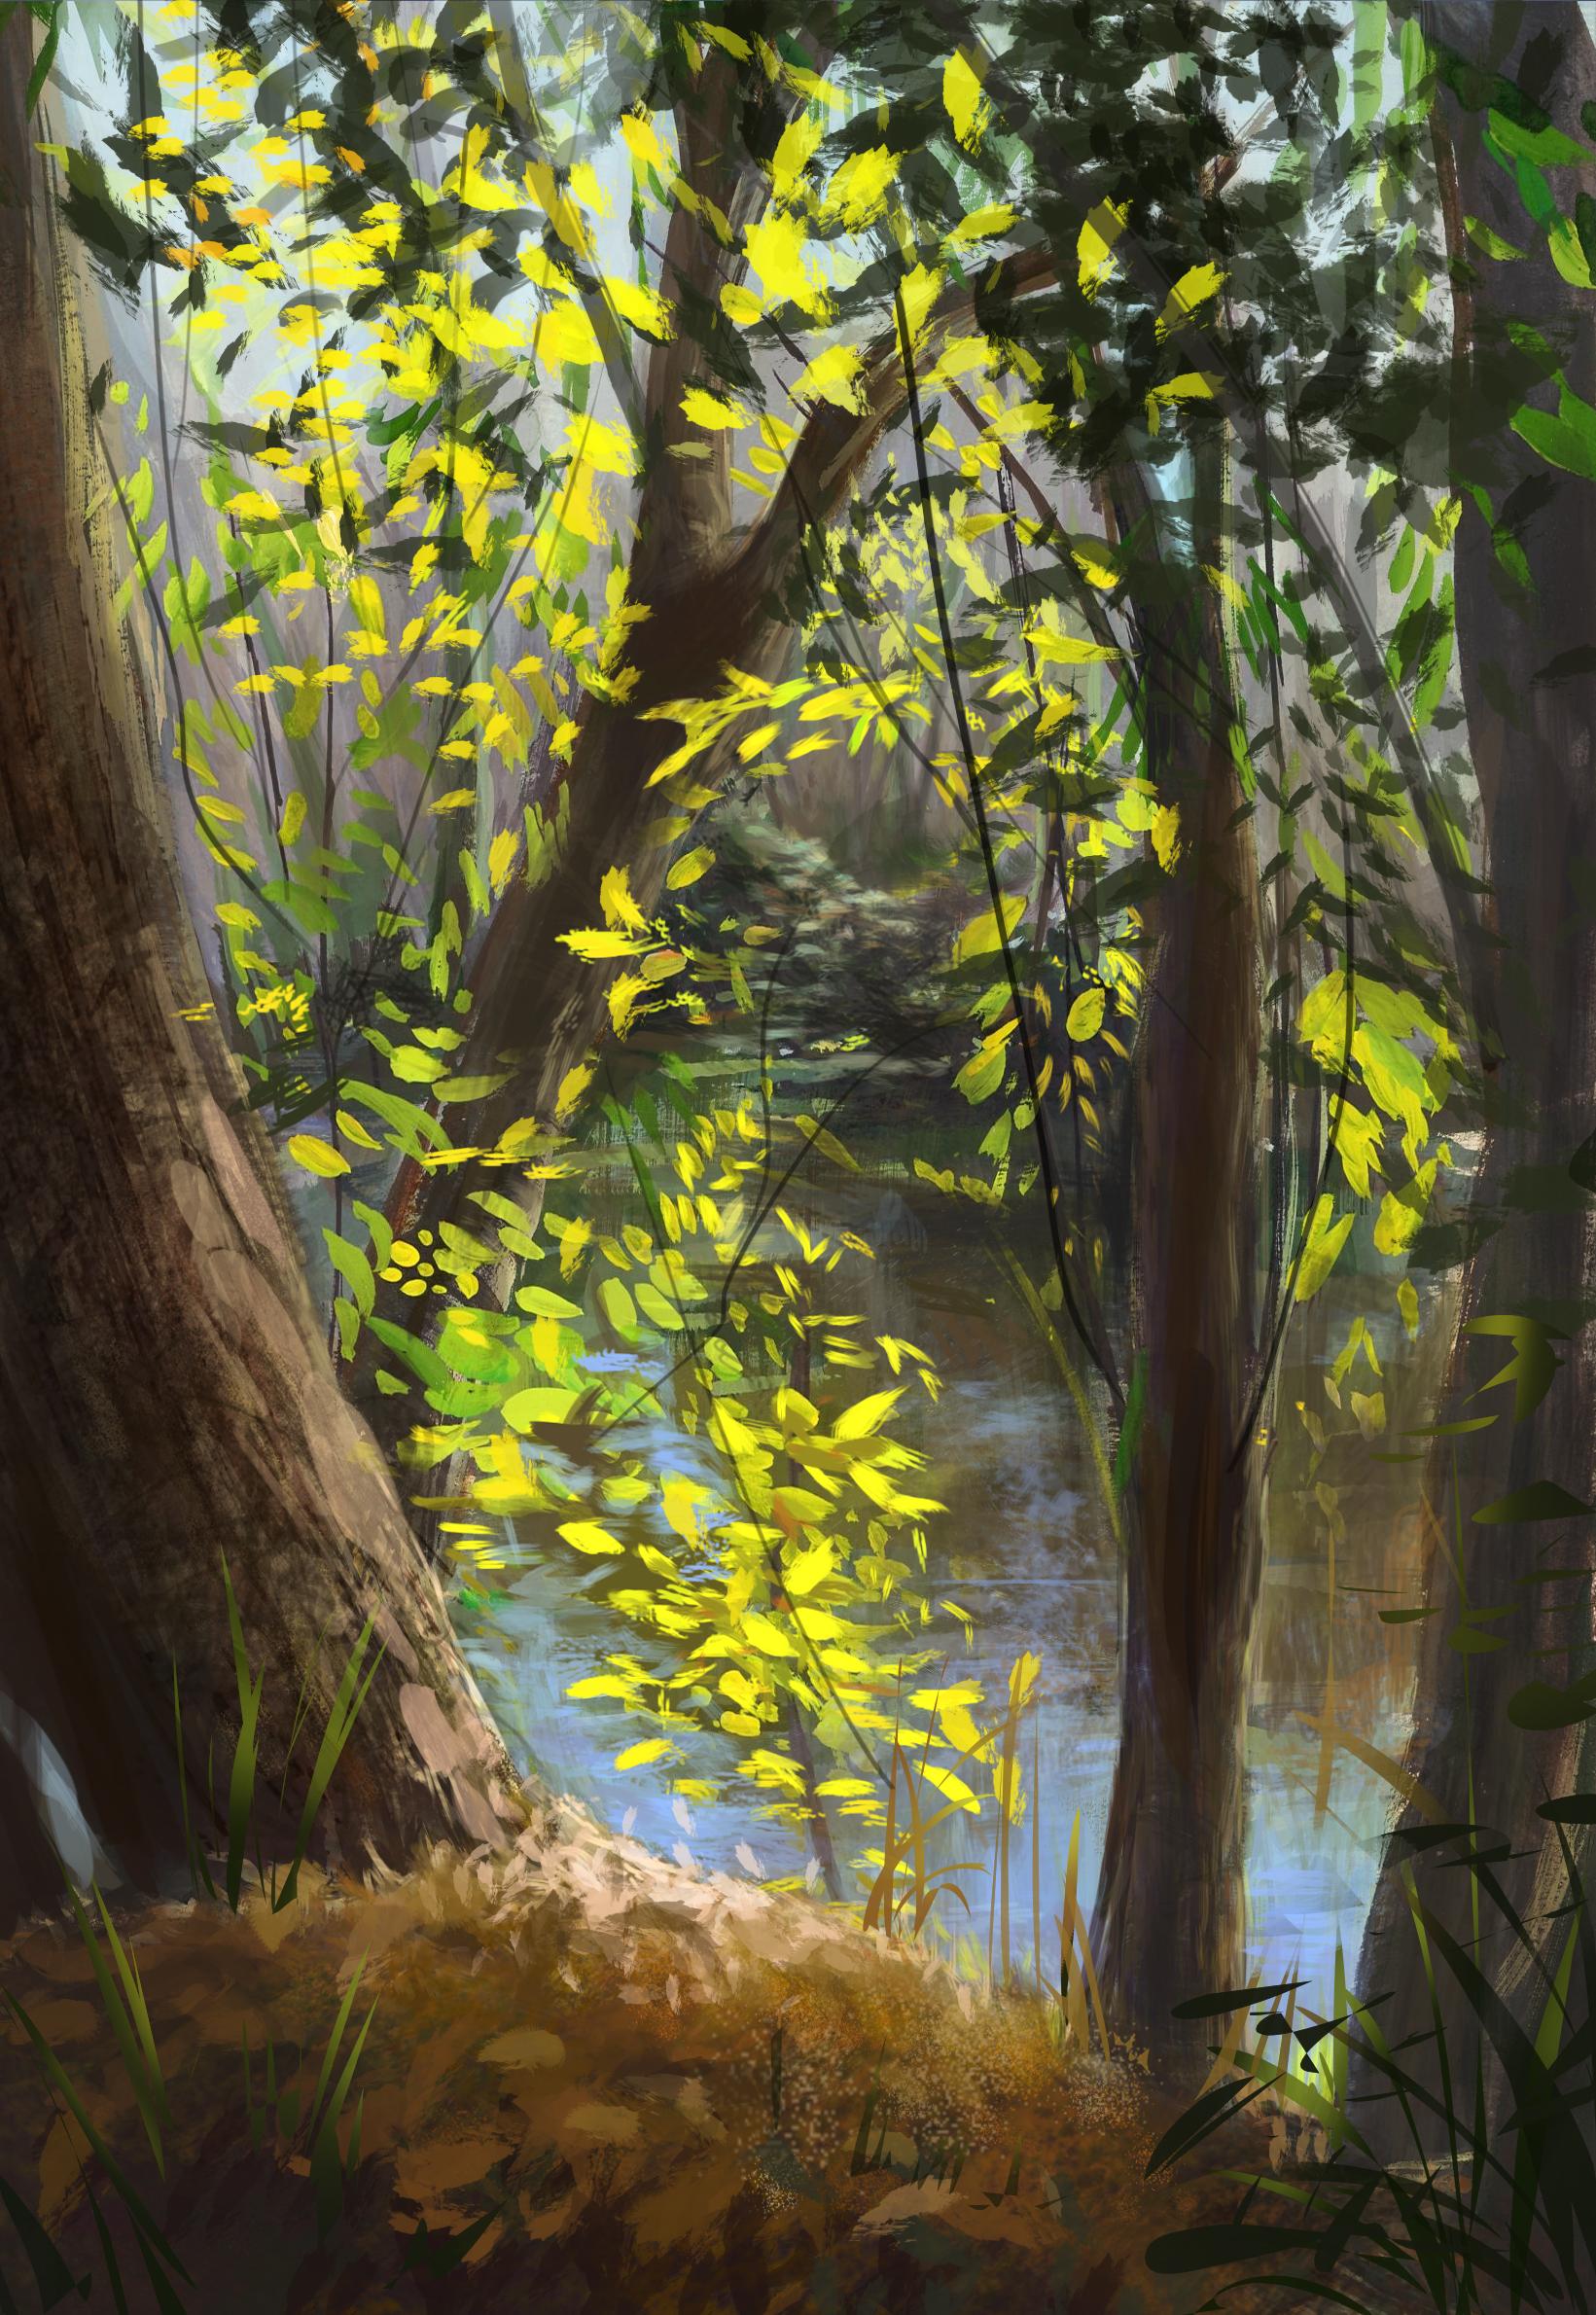 _yesenia_popova_term_5_dgitial_landscape_spring16_yeseniapopova@gmail.com_0240045_ copy.jpg